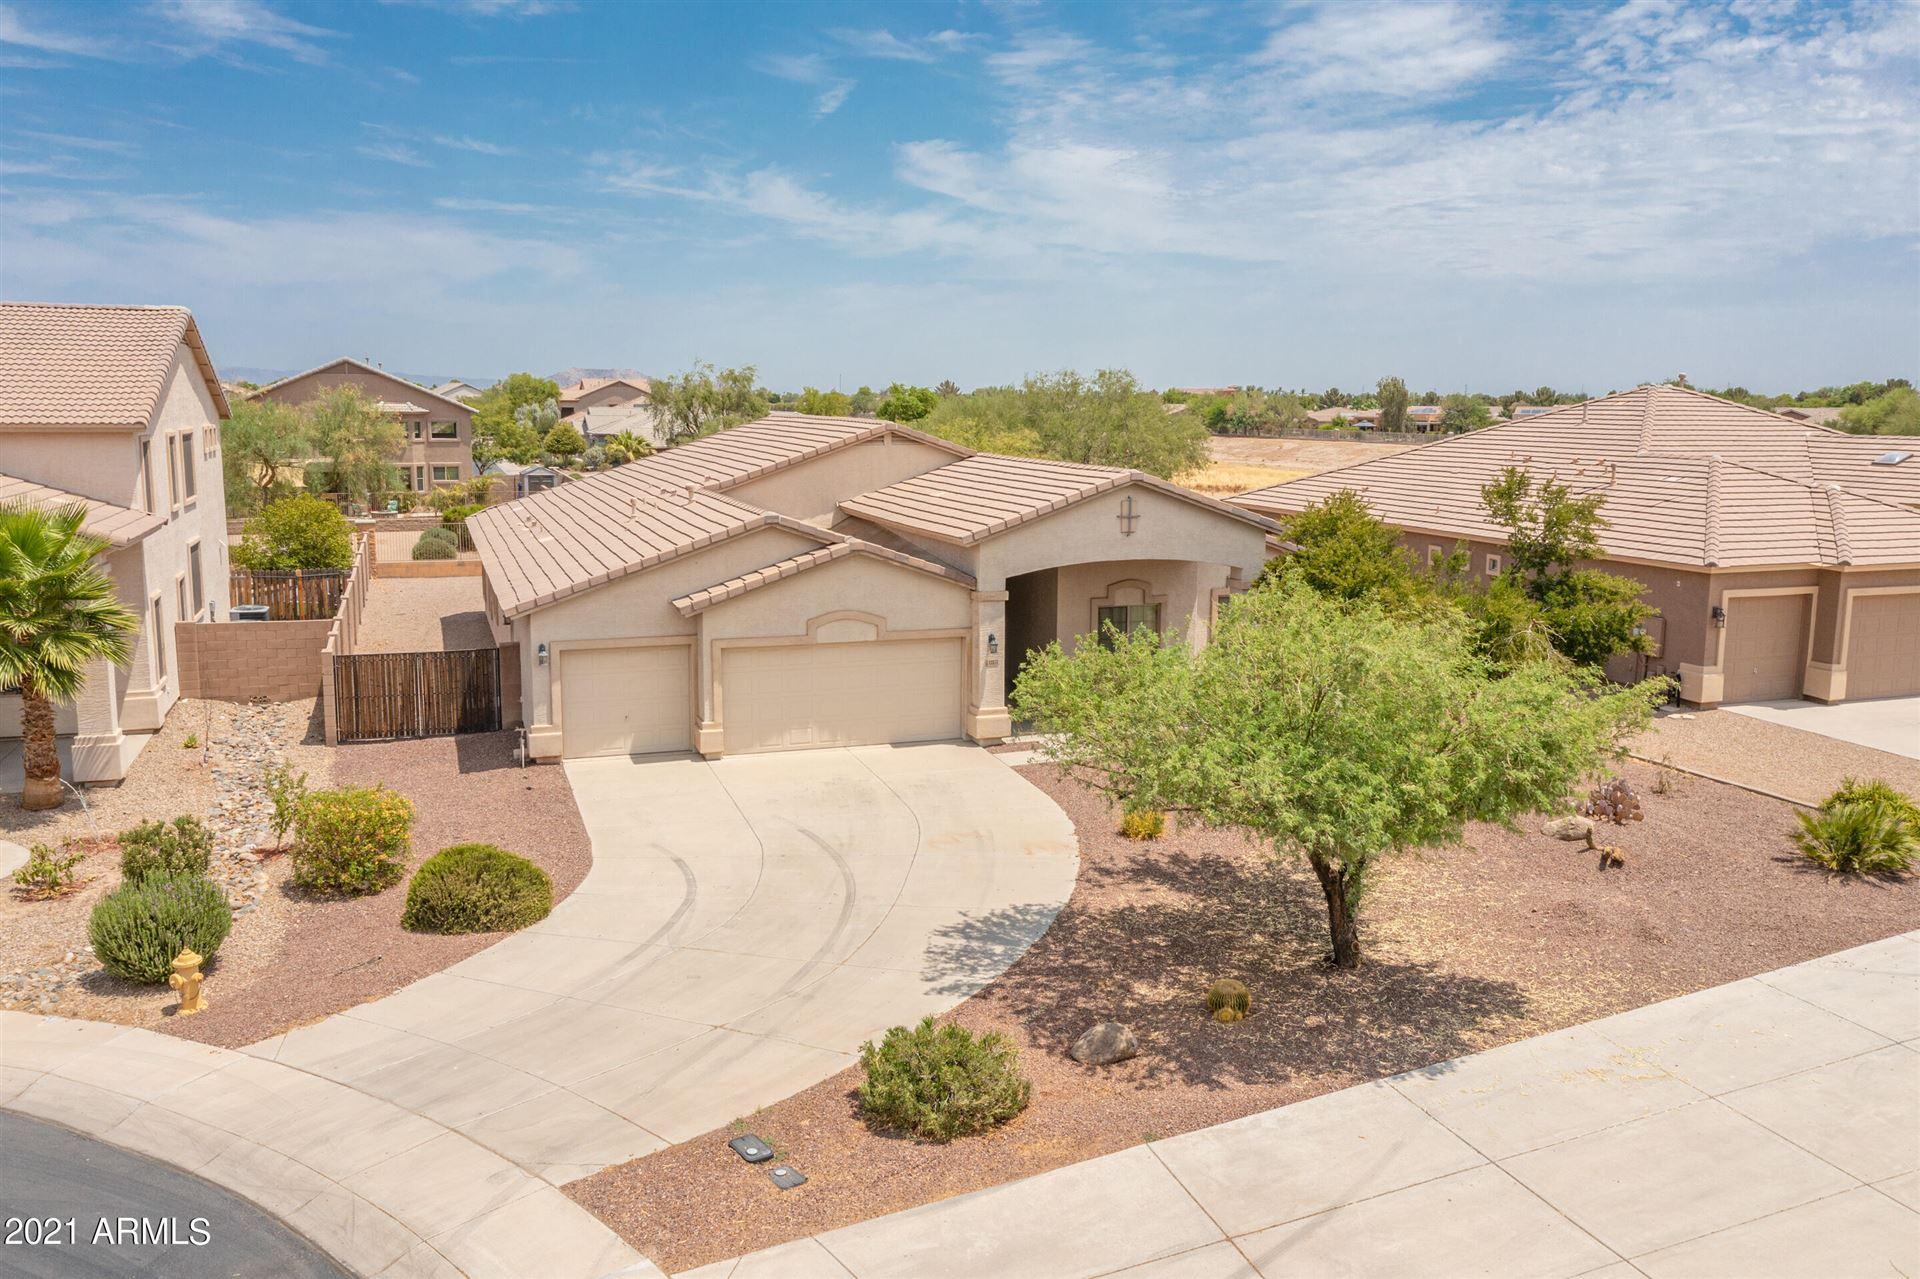 Photo for 43174 W BAILEY Drive, Maricopa, AZ 85138 (MLS # 6274740)